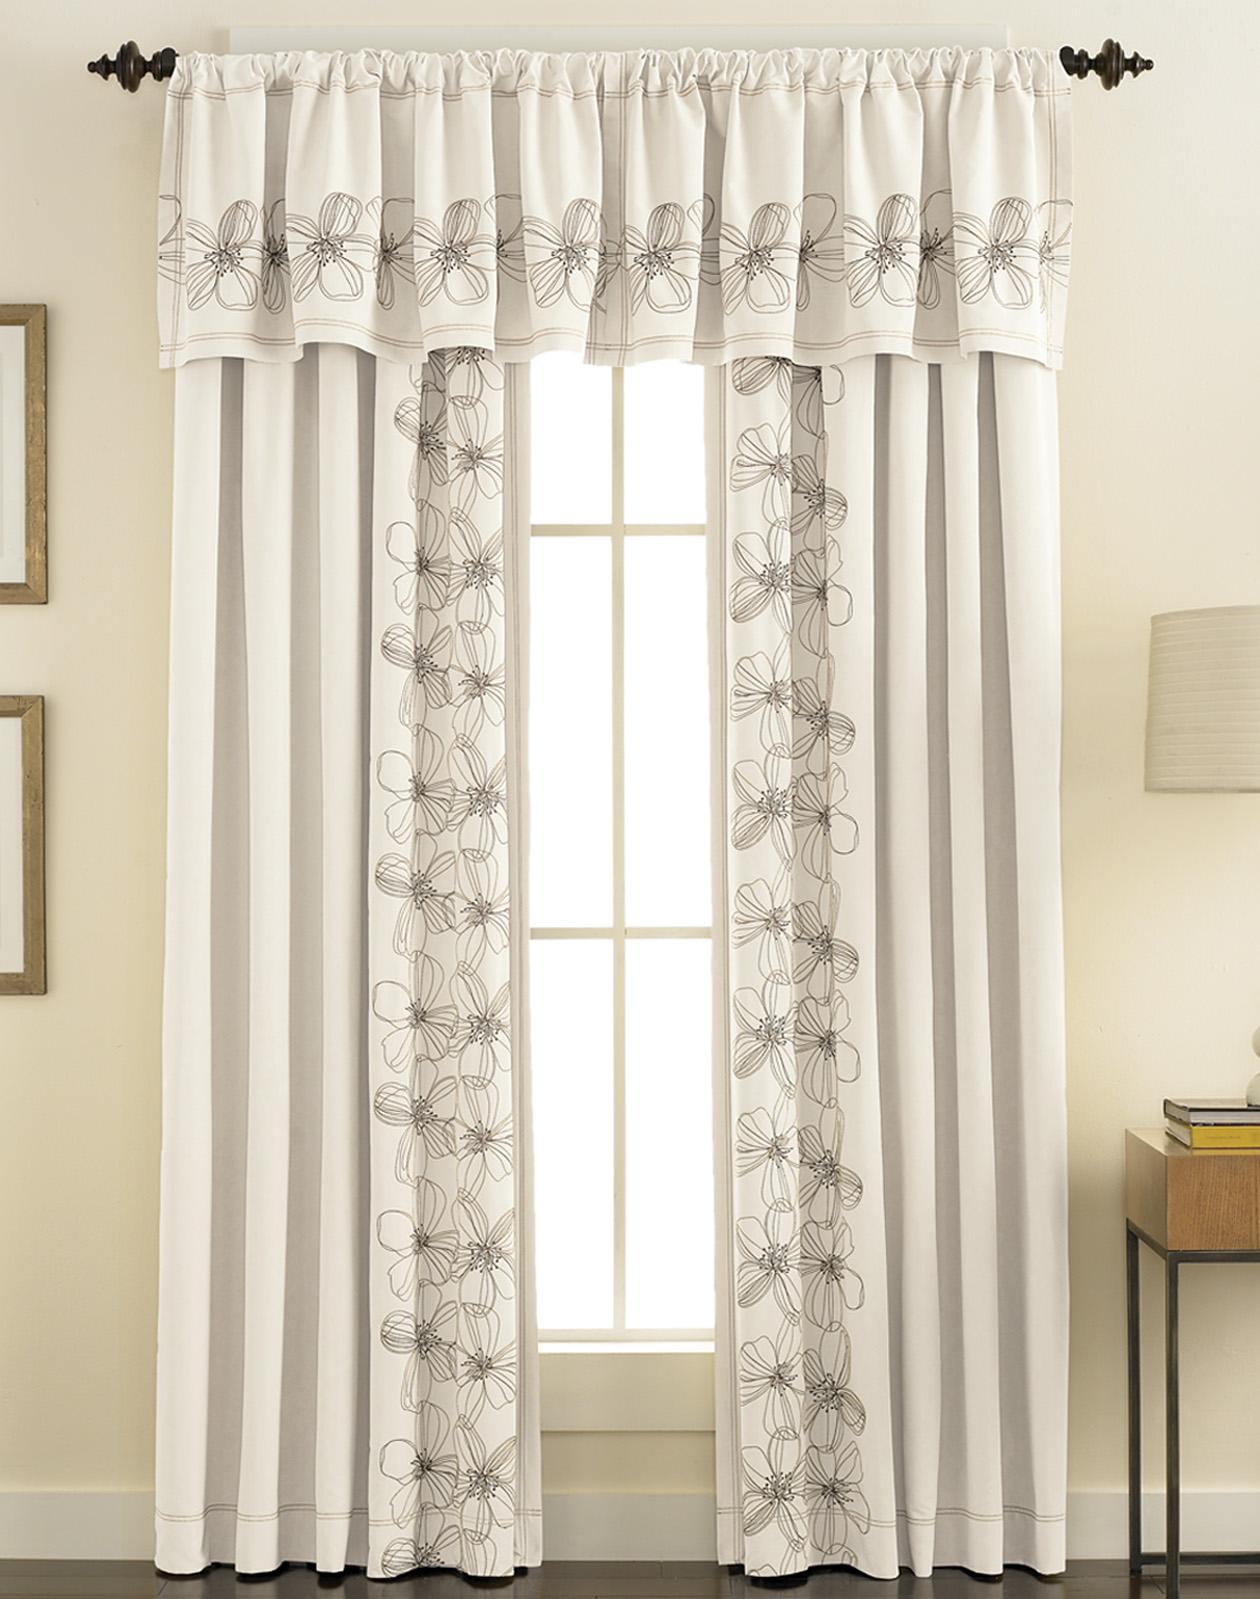 Valence curtains  Furniture Ideas  DeltaAngelGroup